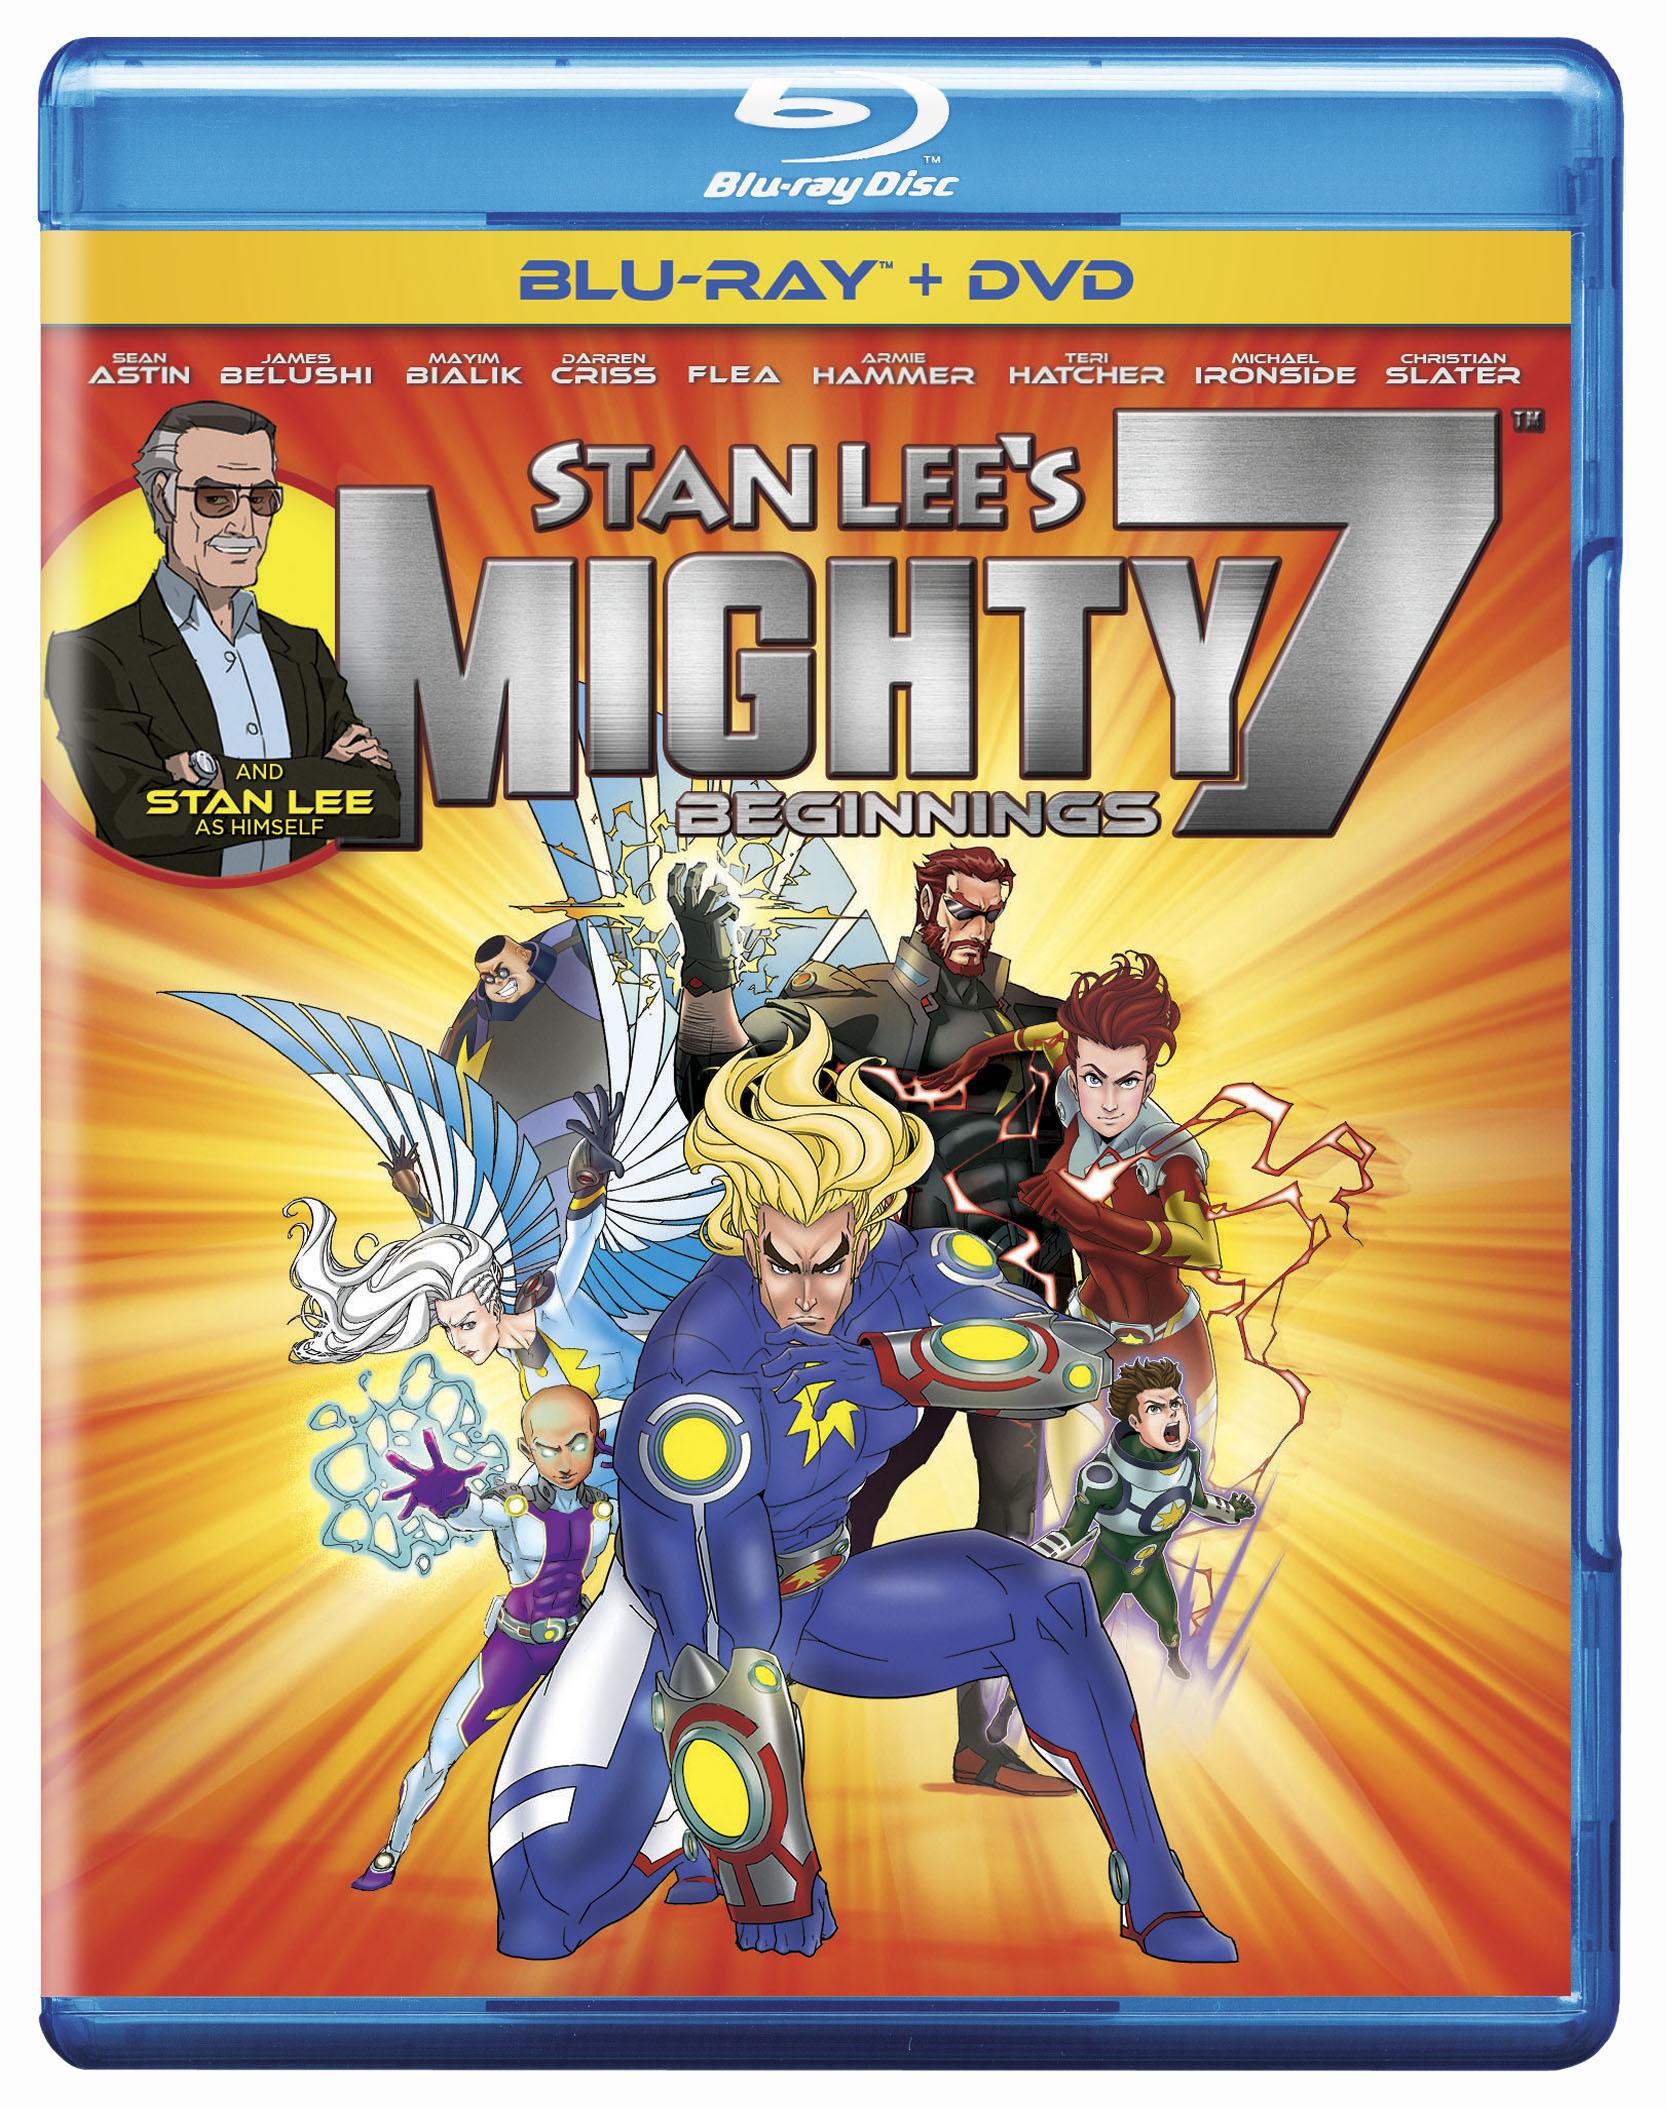 Stan Lee's Mighty 7: Beginnings doubled as Stan Lee's Mighty 7 Ending